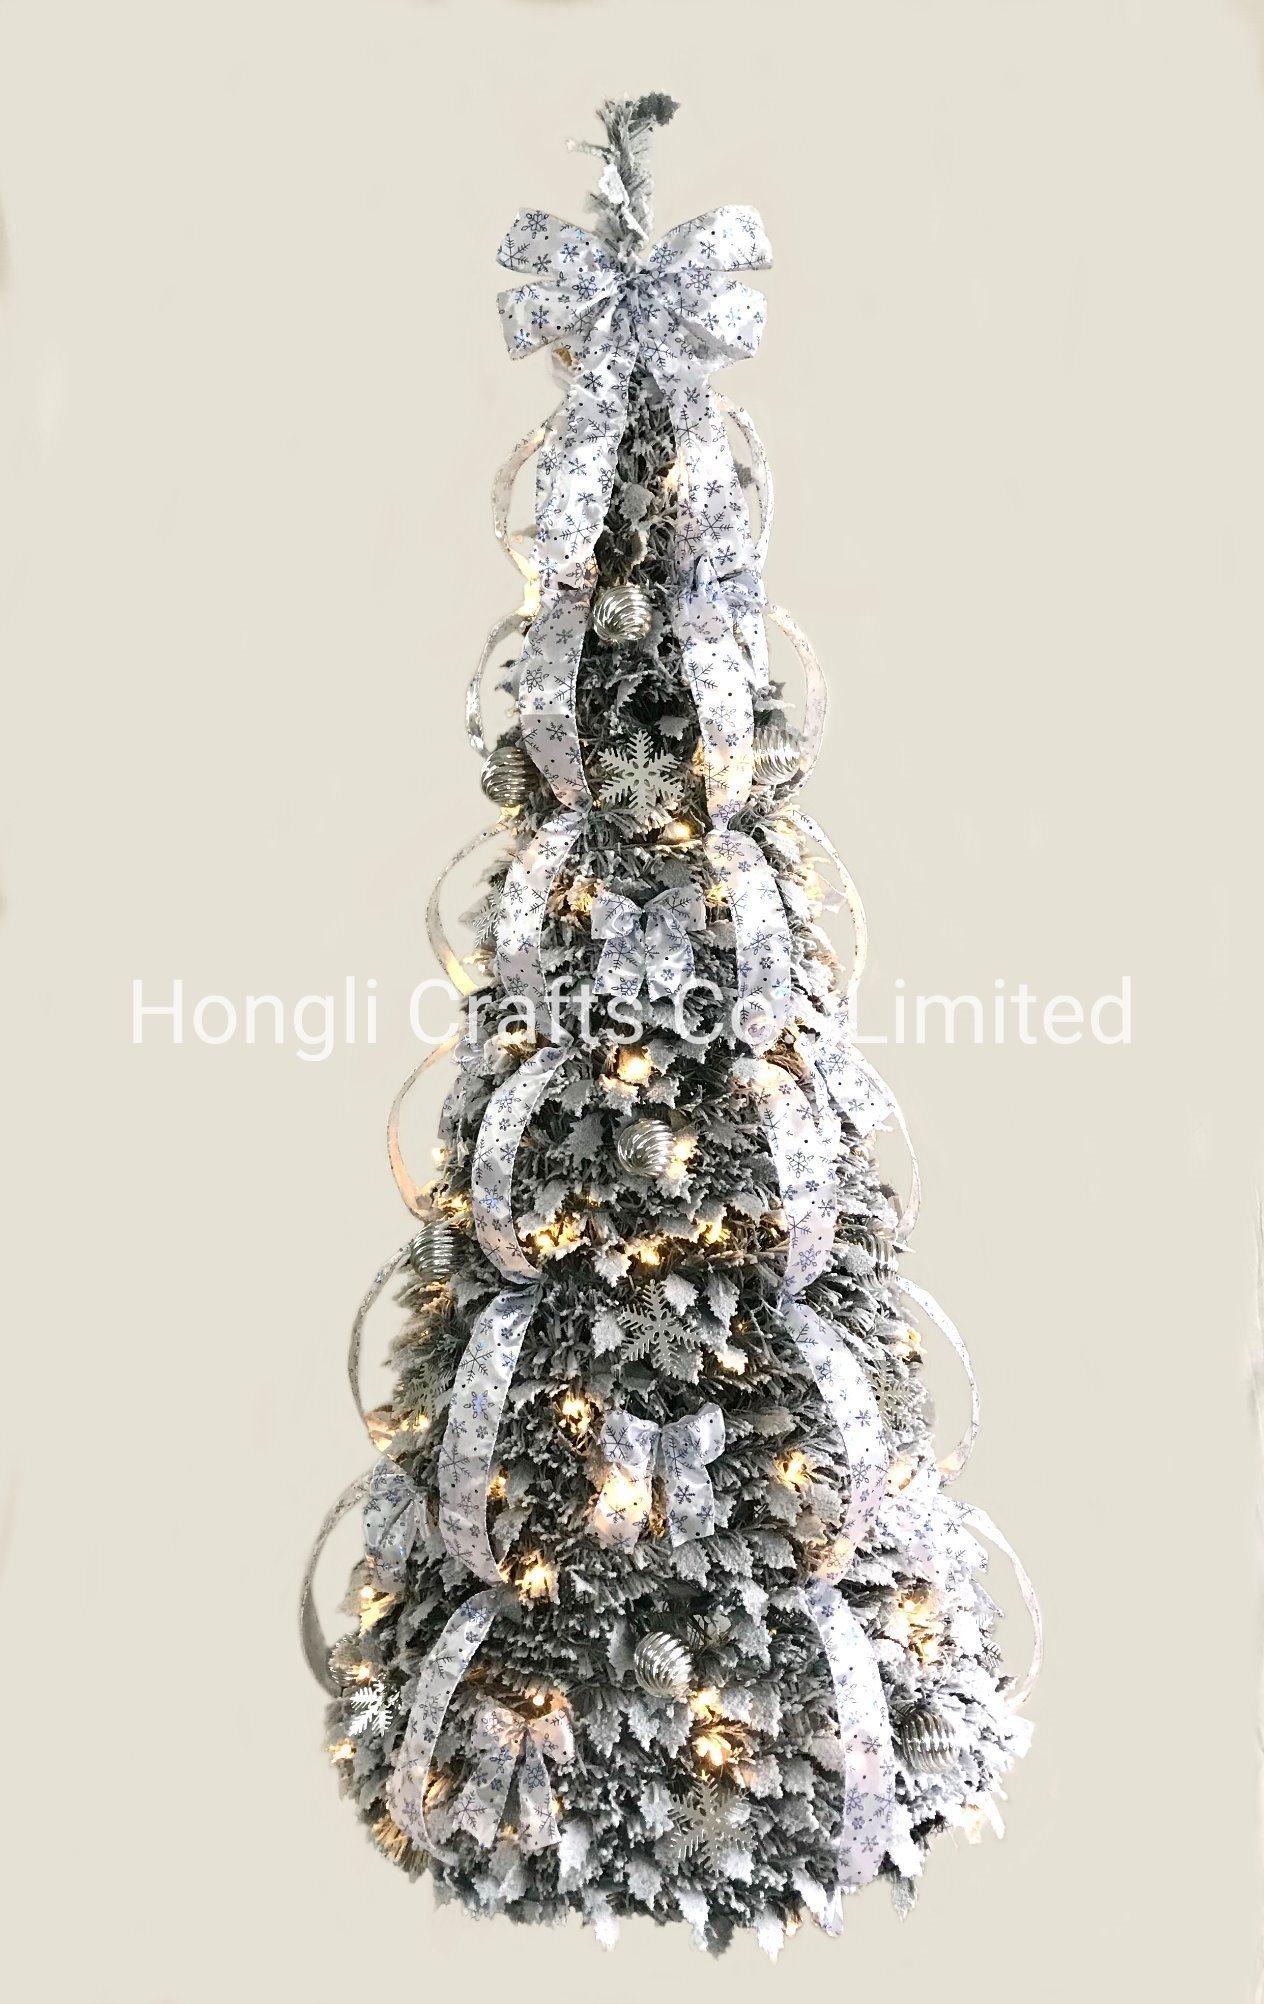 China 180cm Pre Lit Pop Up Dressed White Flocked Christmas Tree China Pop Up Tree And Chirstmas Tree Price